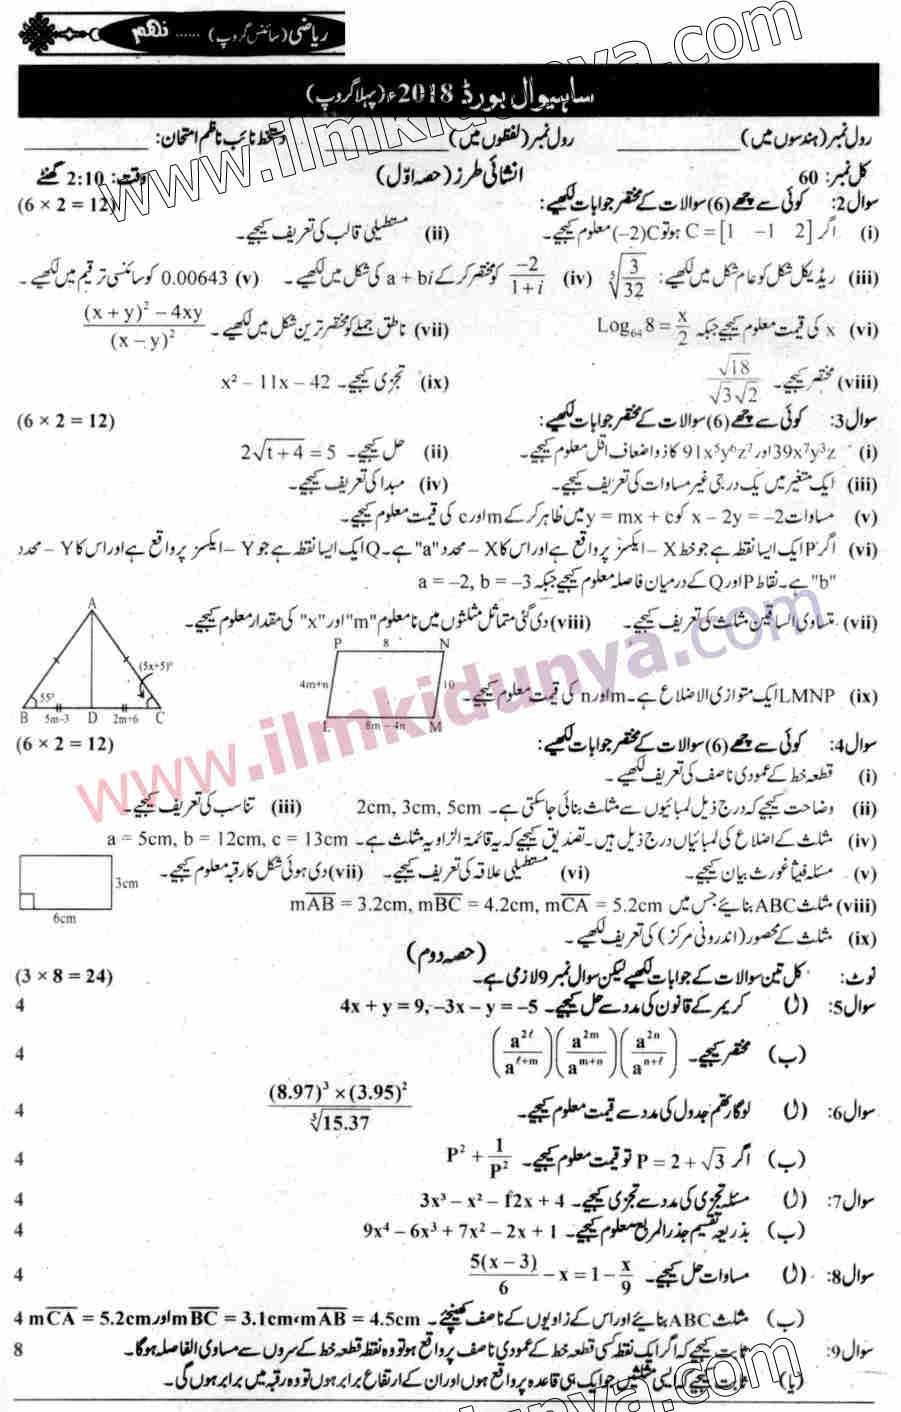 Past Papers 2018 Sahiwal Board 9th Class Mathematics Urdu